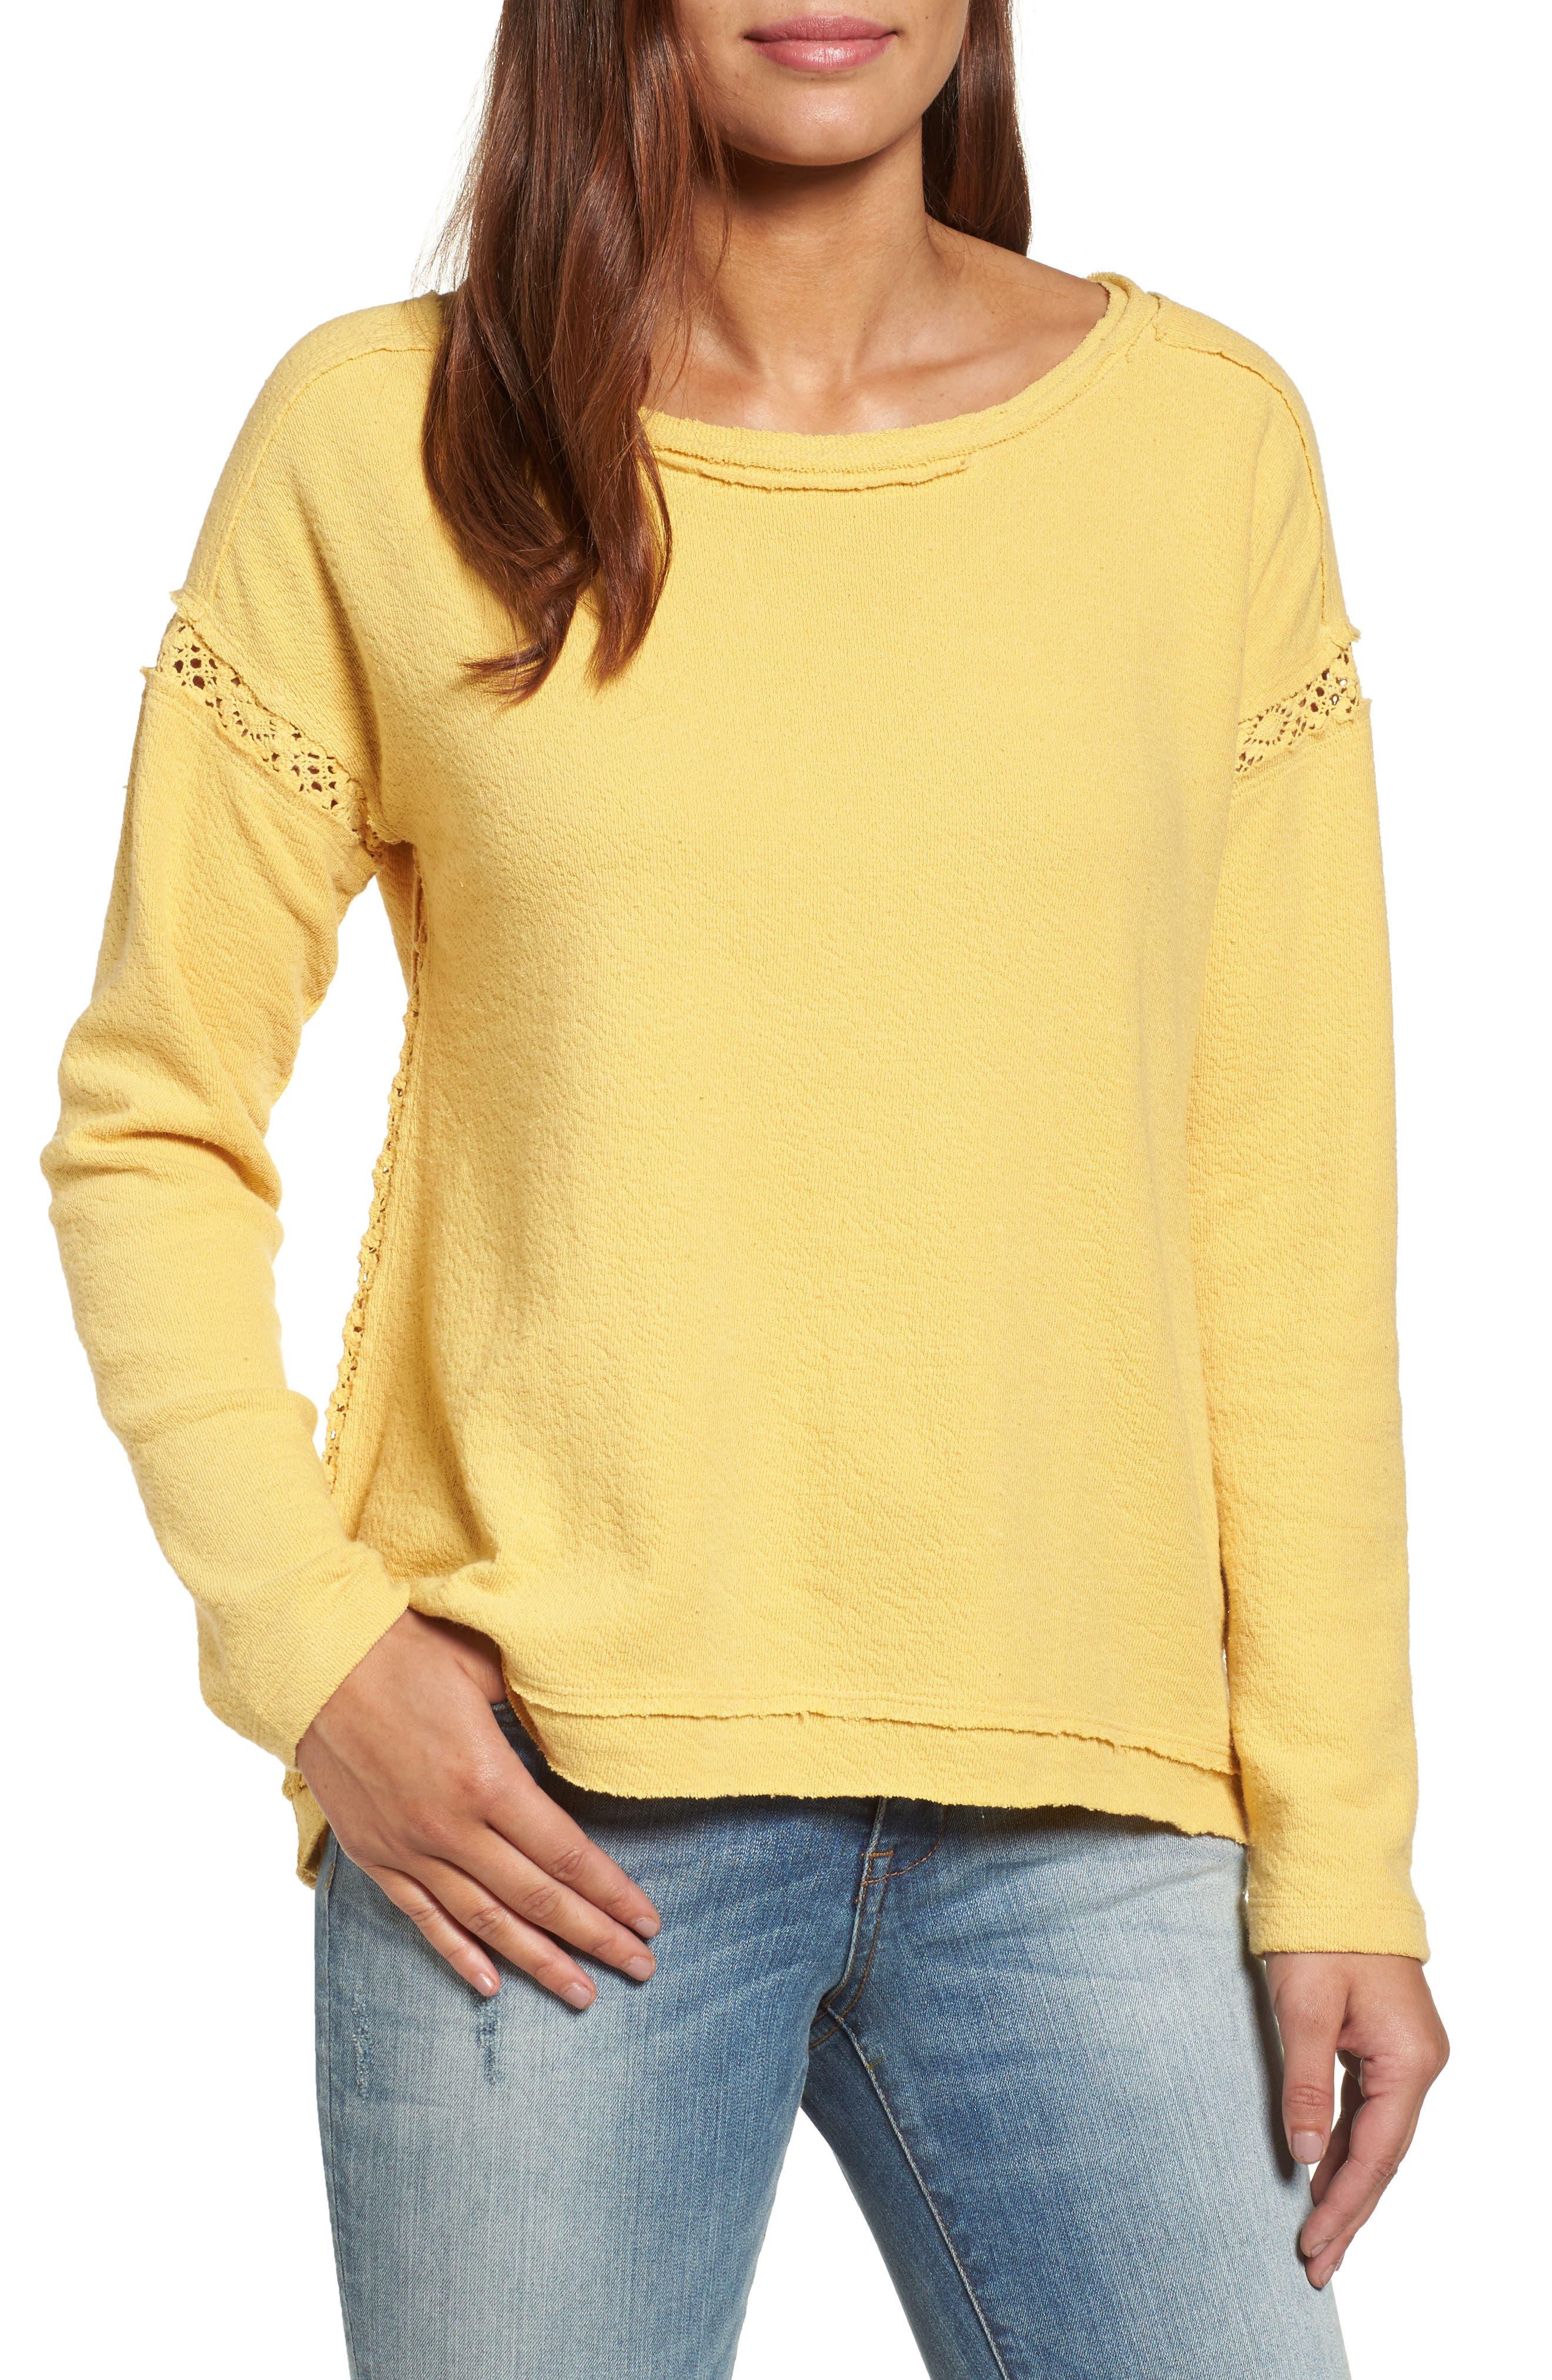 Alternate Image 1 Selected - Caslon® Crochet Lace Trim Sweatshirt